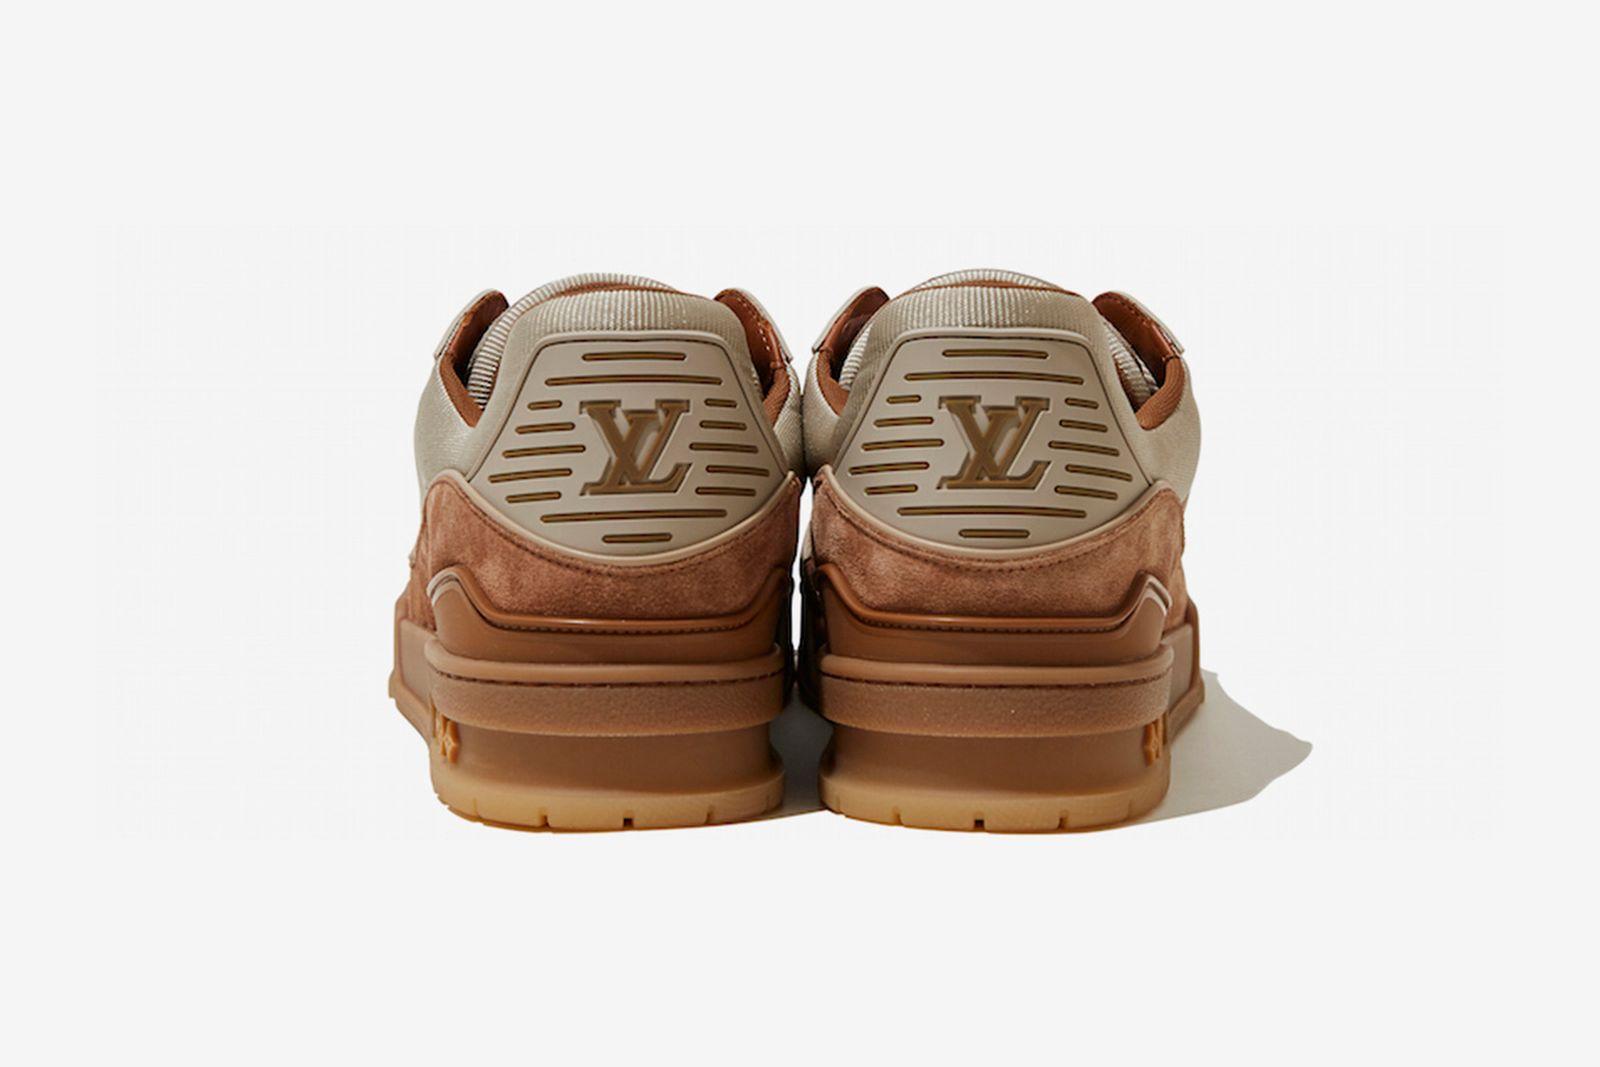 louis vuitton fw19 footwear release date price virgil abloh